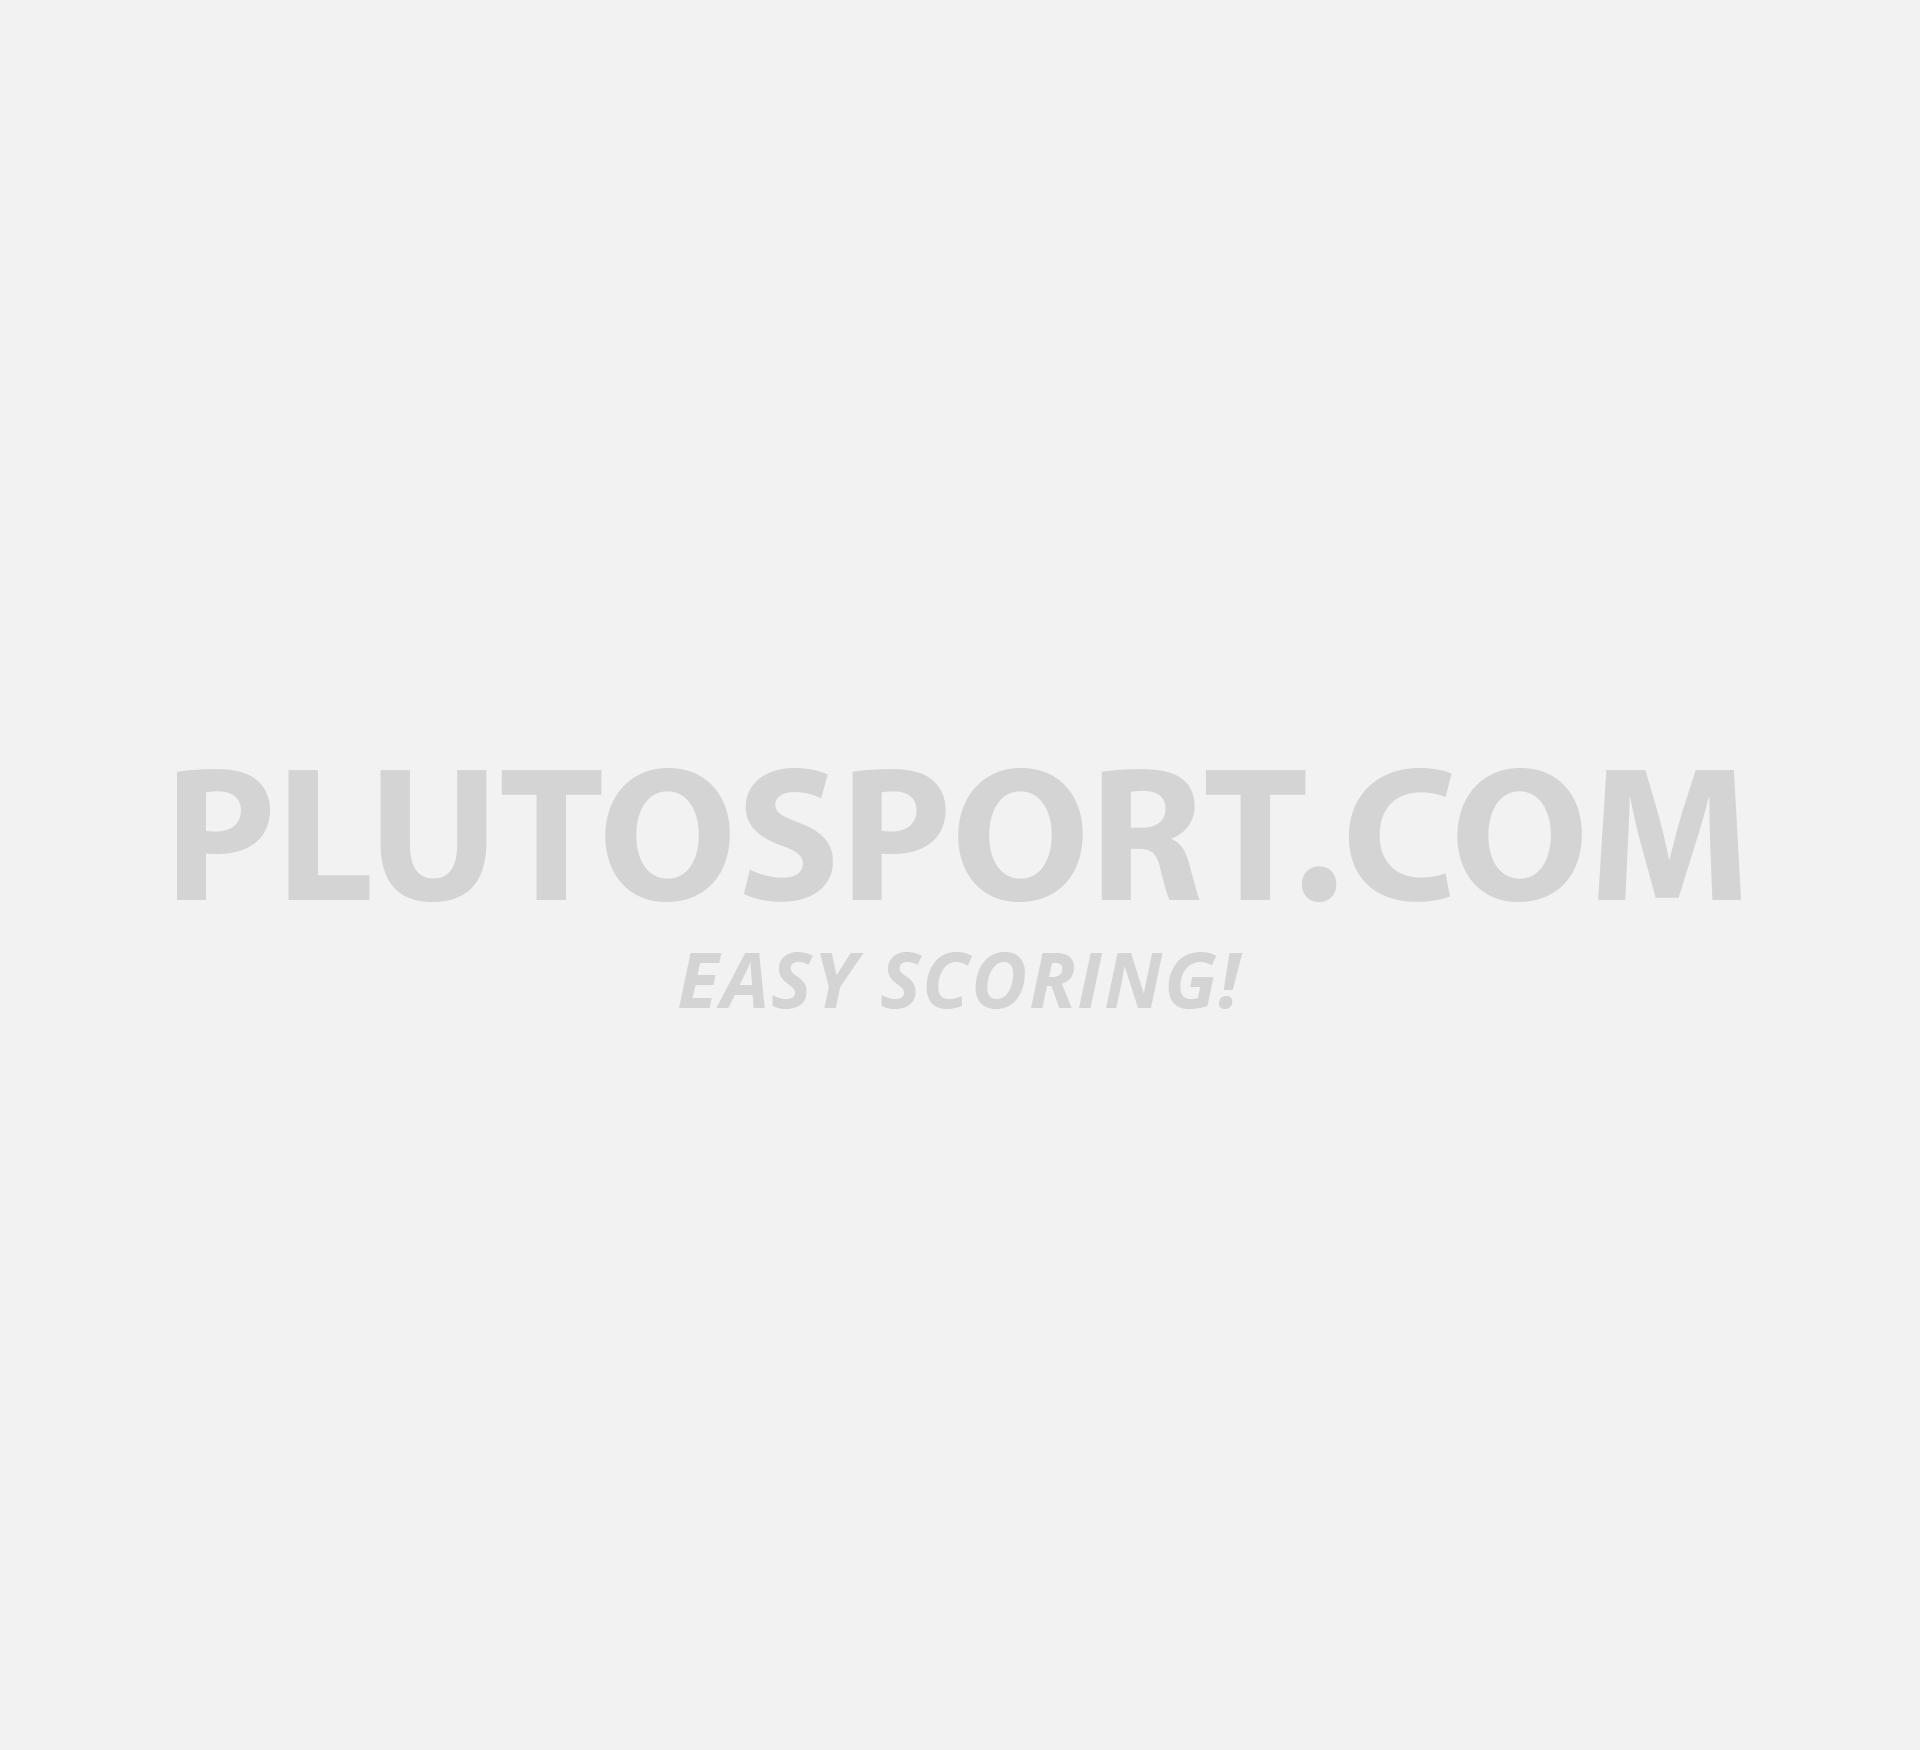 811e6100669 Uhlsport Score Goalkeeper Set Junior - Sets - Goalkeepers - Football -  Sports | Plutosport